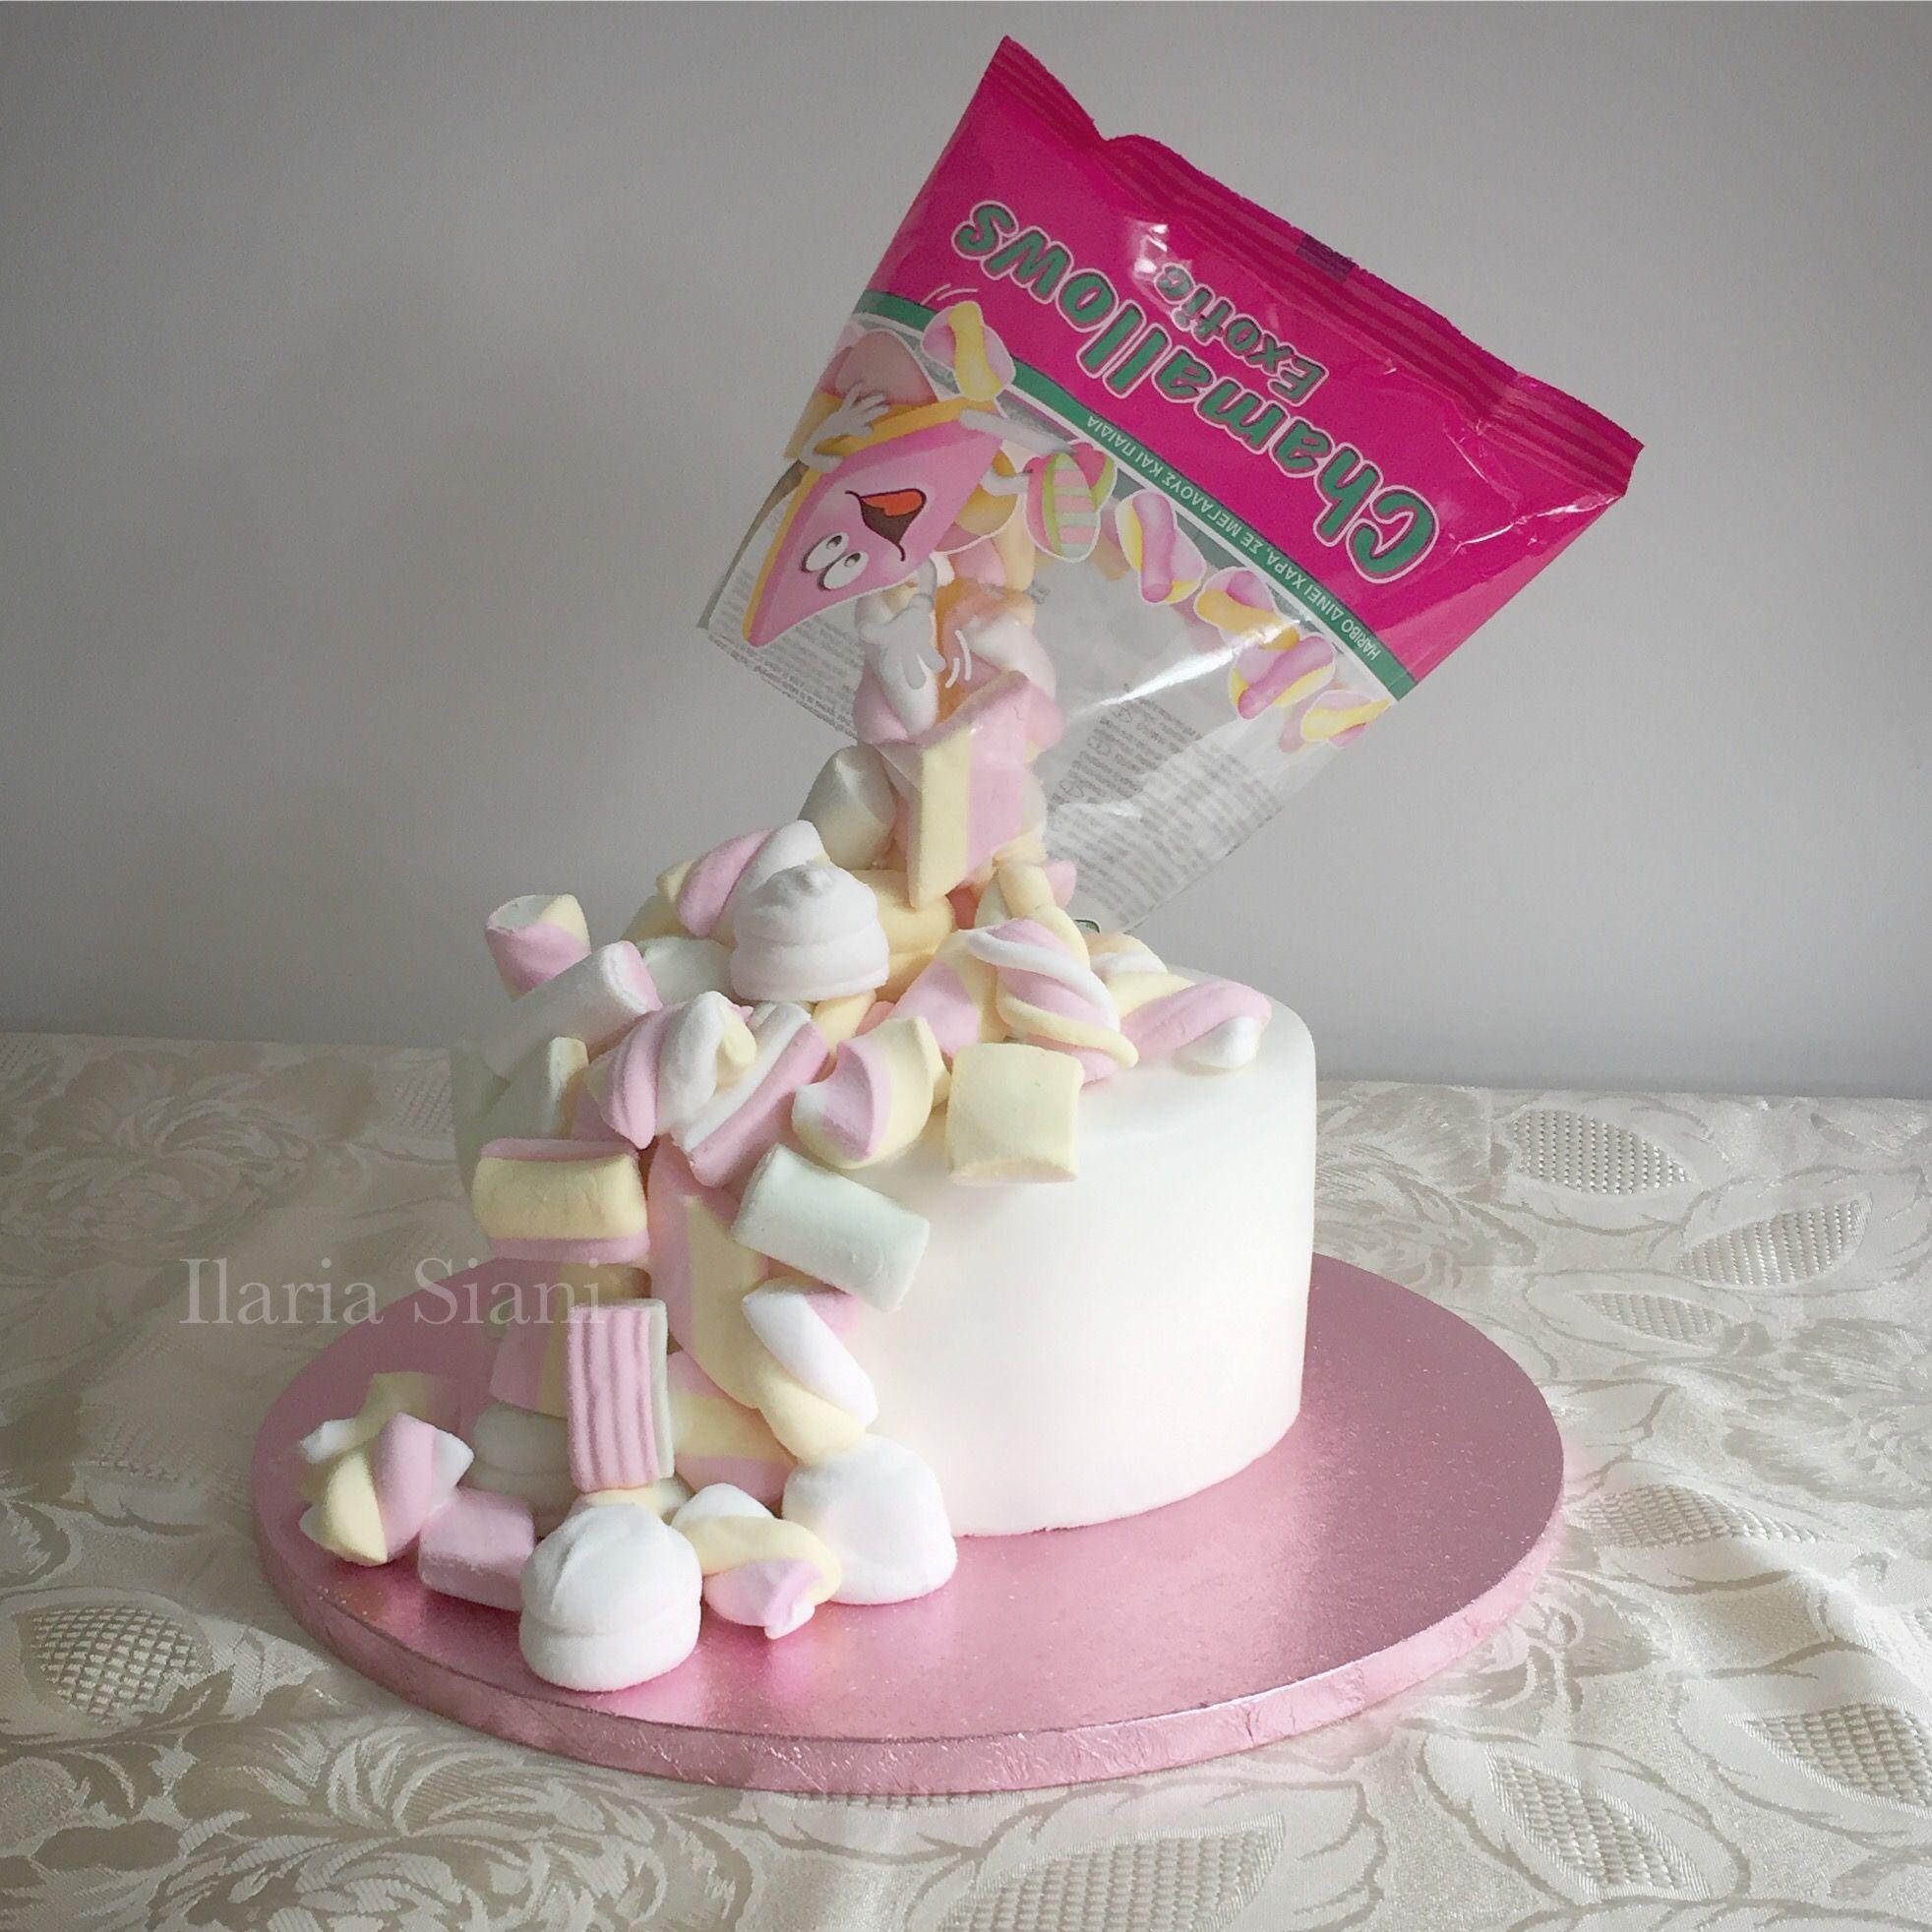 Marshmallow anti-gravity cake #instafood #ilas #ilassweetness #marshmallow #haribo #cakedesign #pastadizucchero #sugarpaste #antigravity #antigravitycake #cake #torta #compleanno #happybirthday Per info e richieste contattami qui www.facebook.com/ilascake e se ti va metti mi piace alla mia pagina #gravitycake